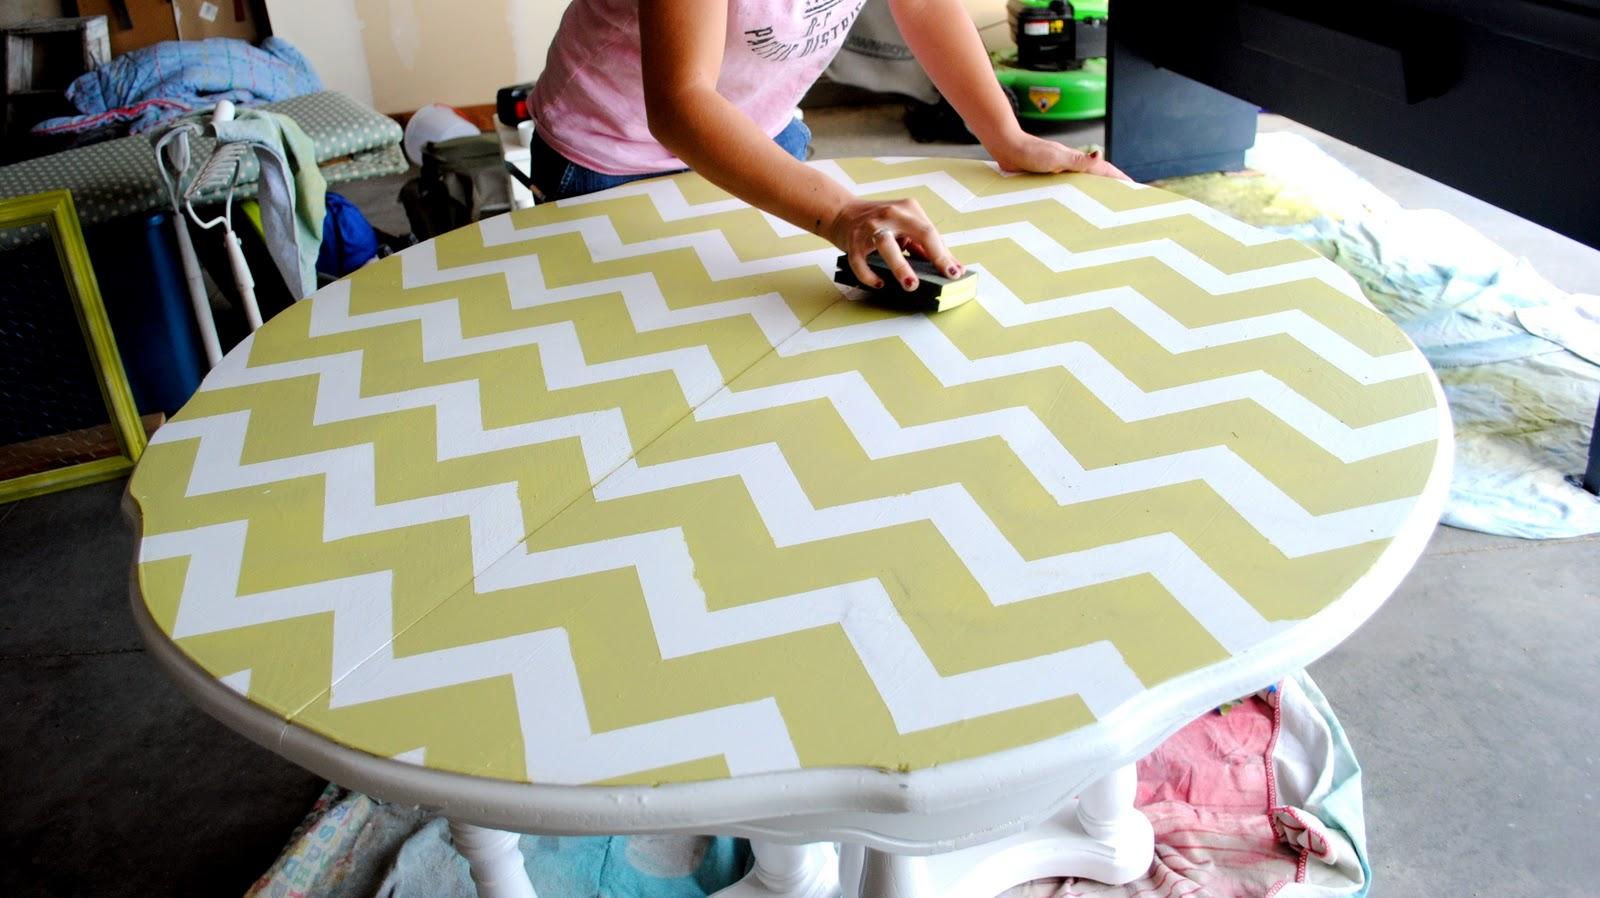 Покраска стола зигзагом